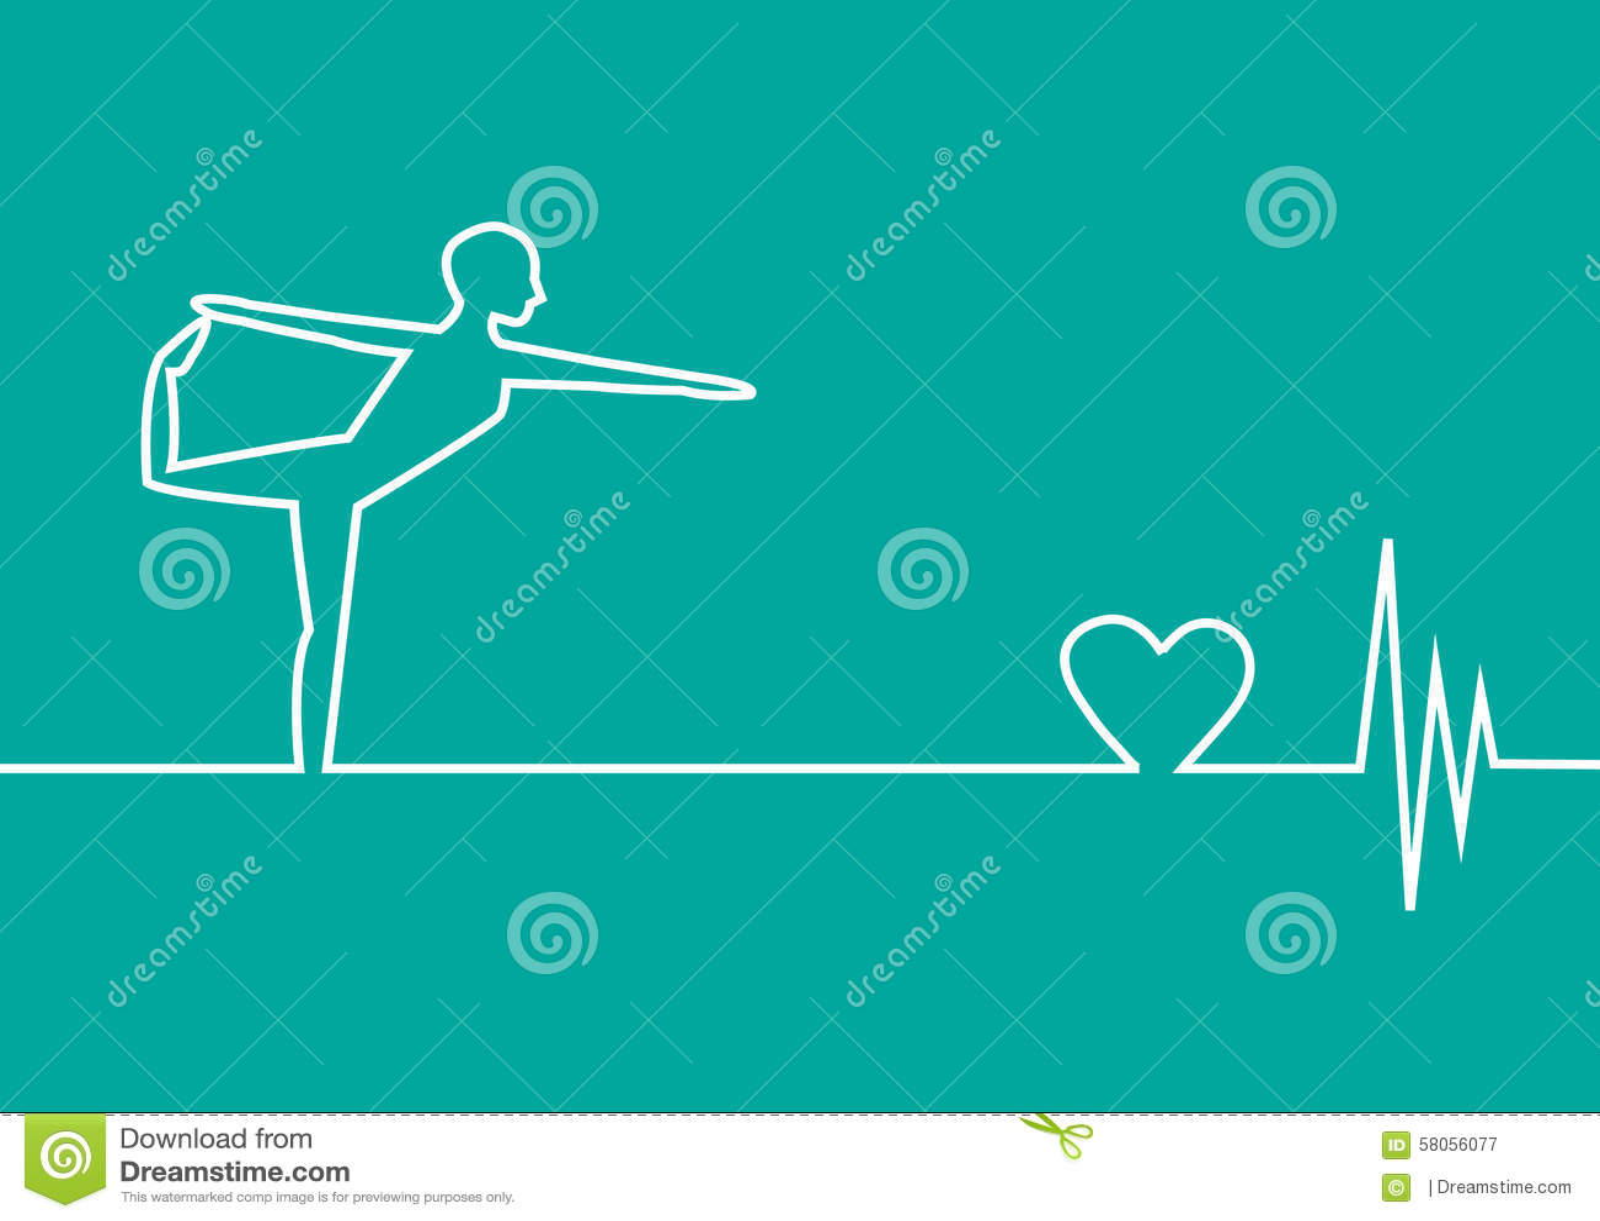 Yoga Exercise With EKG Heart On Green Background Design